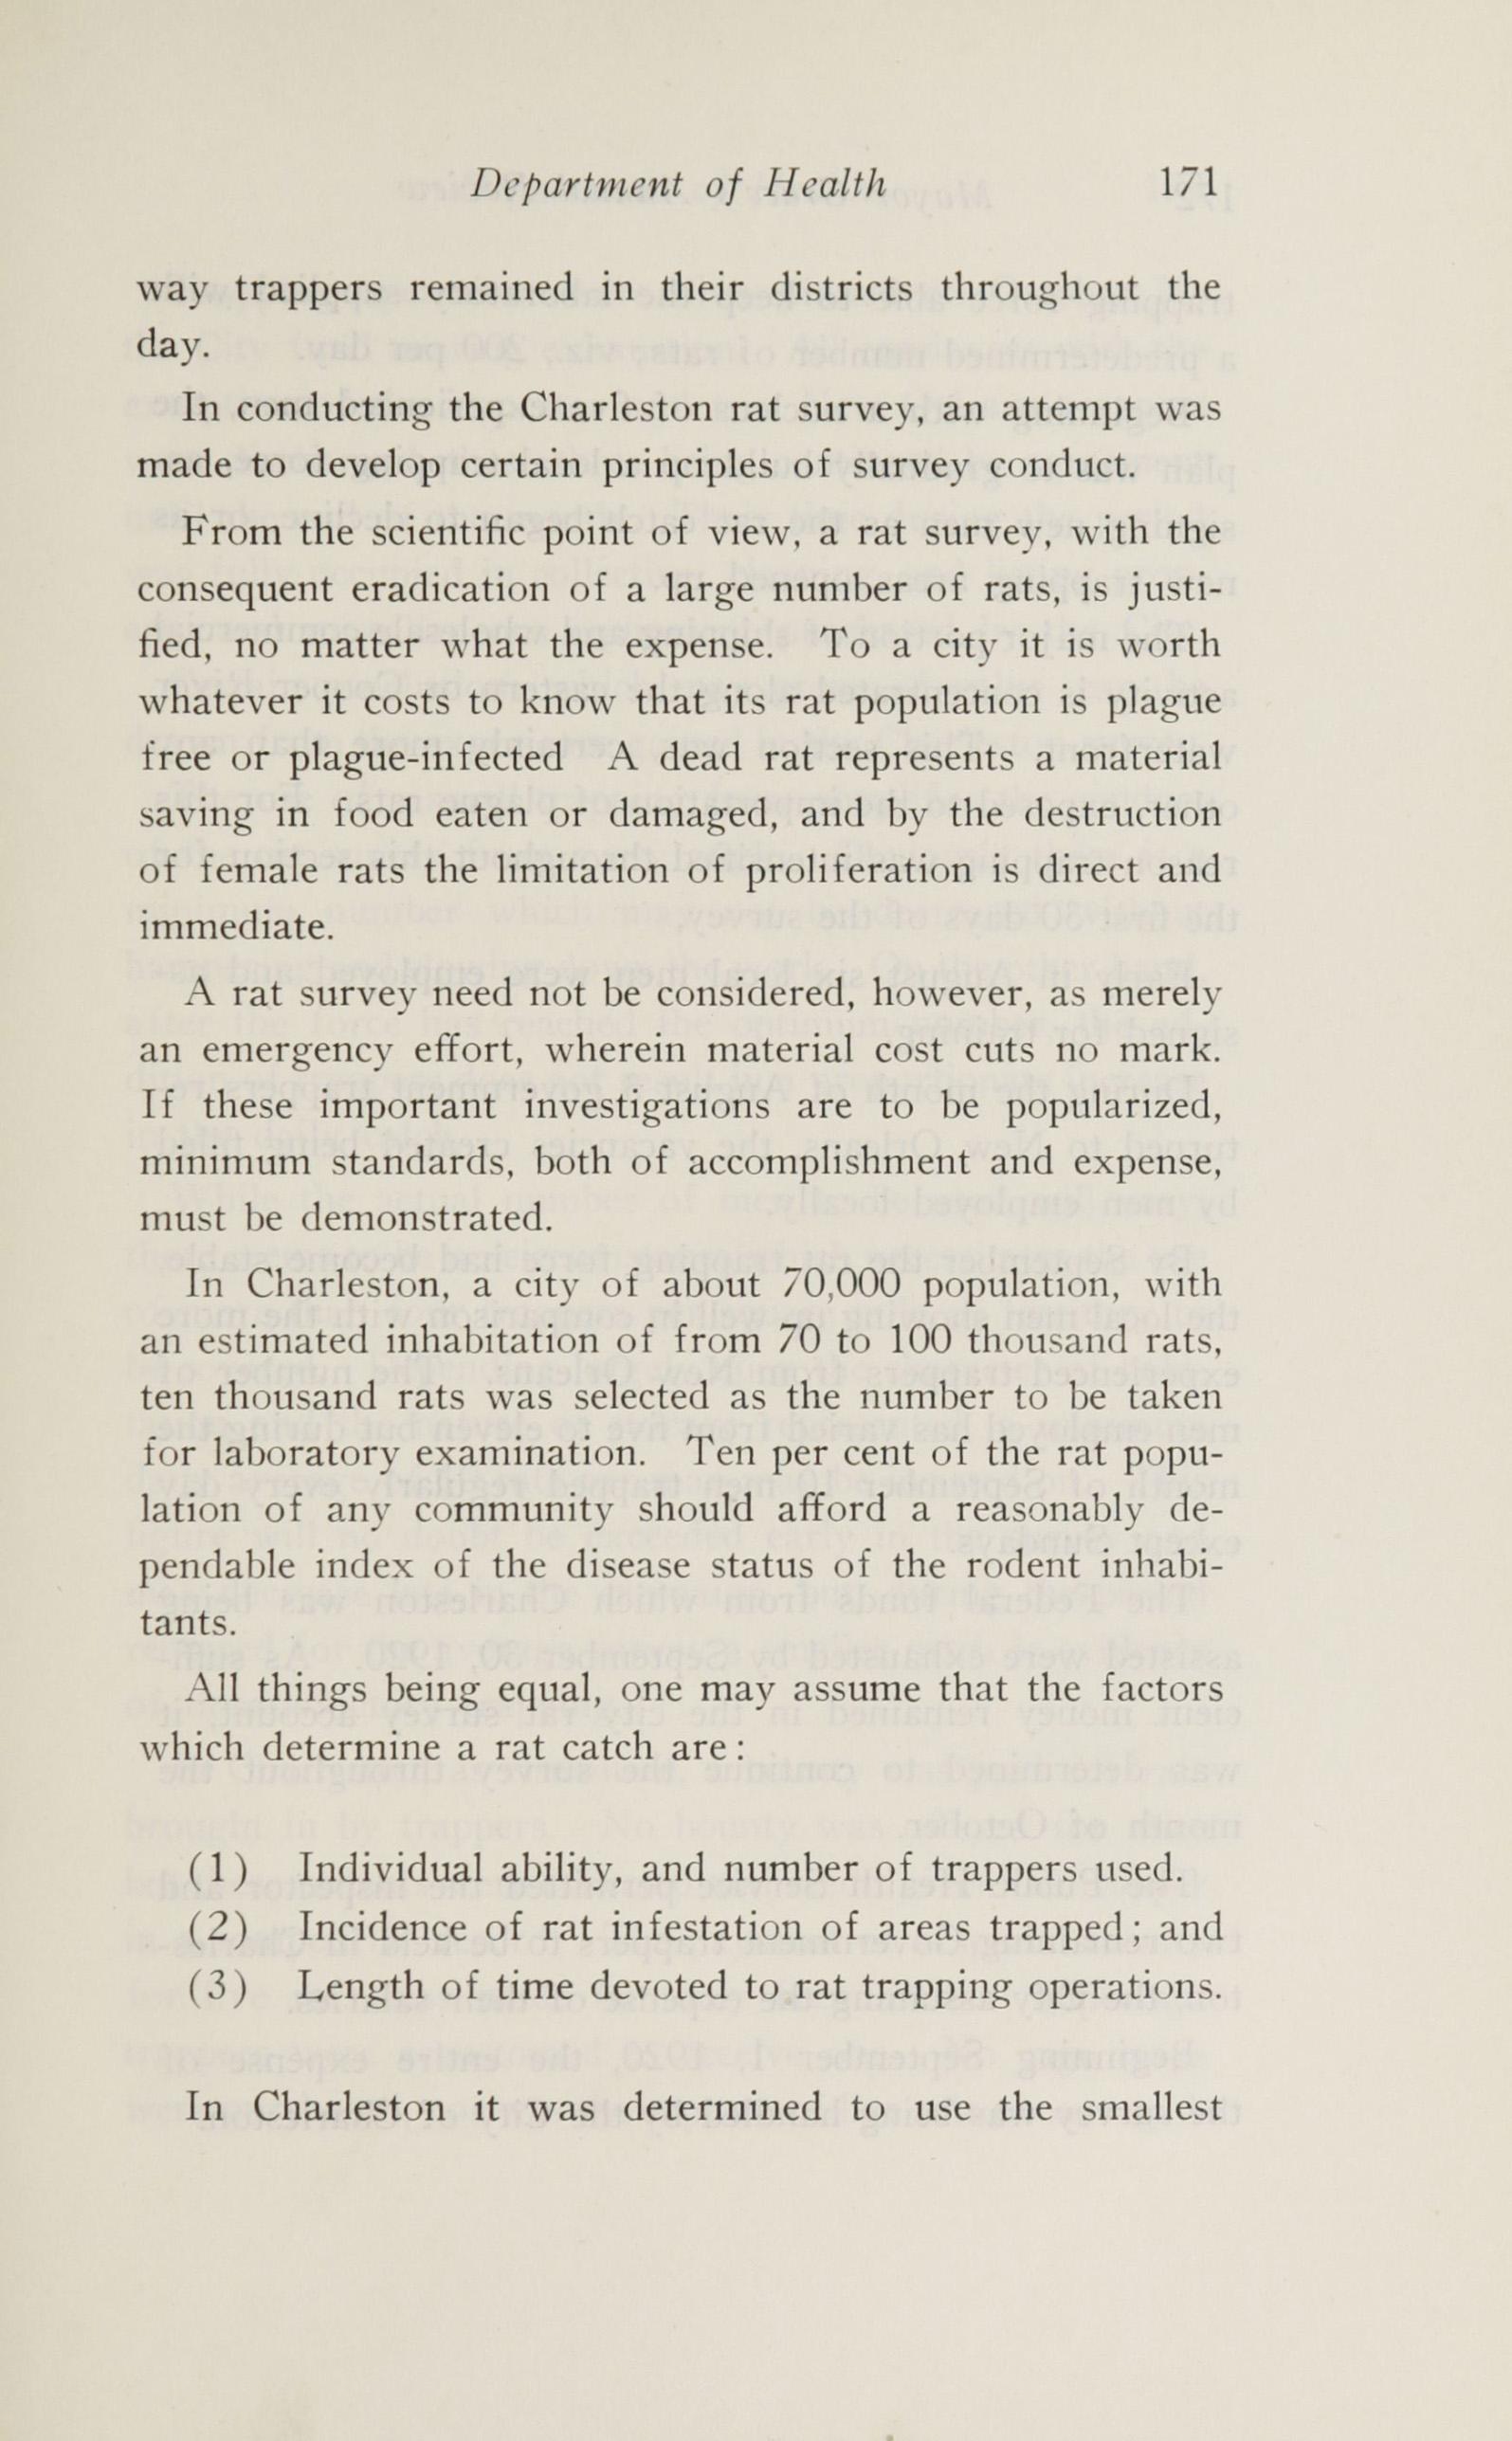 Charleston Yearbook, 1920, page 171